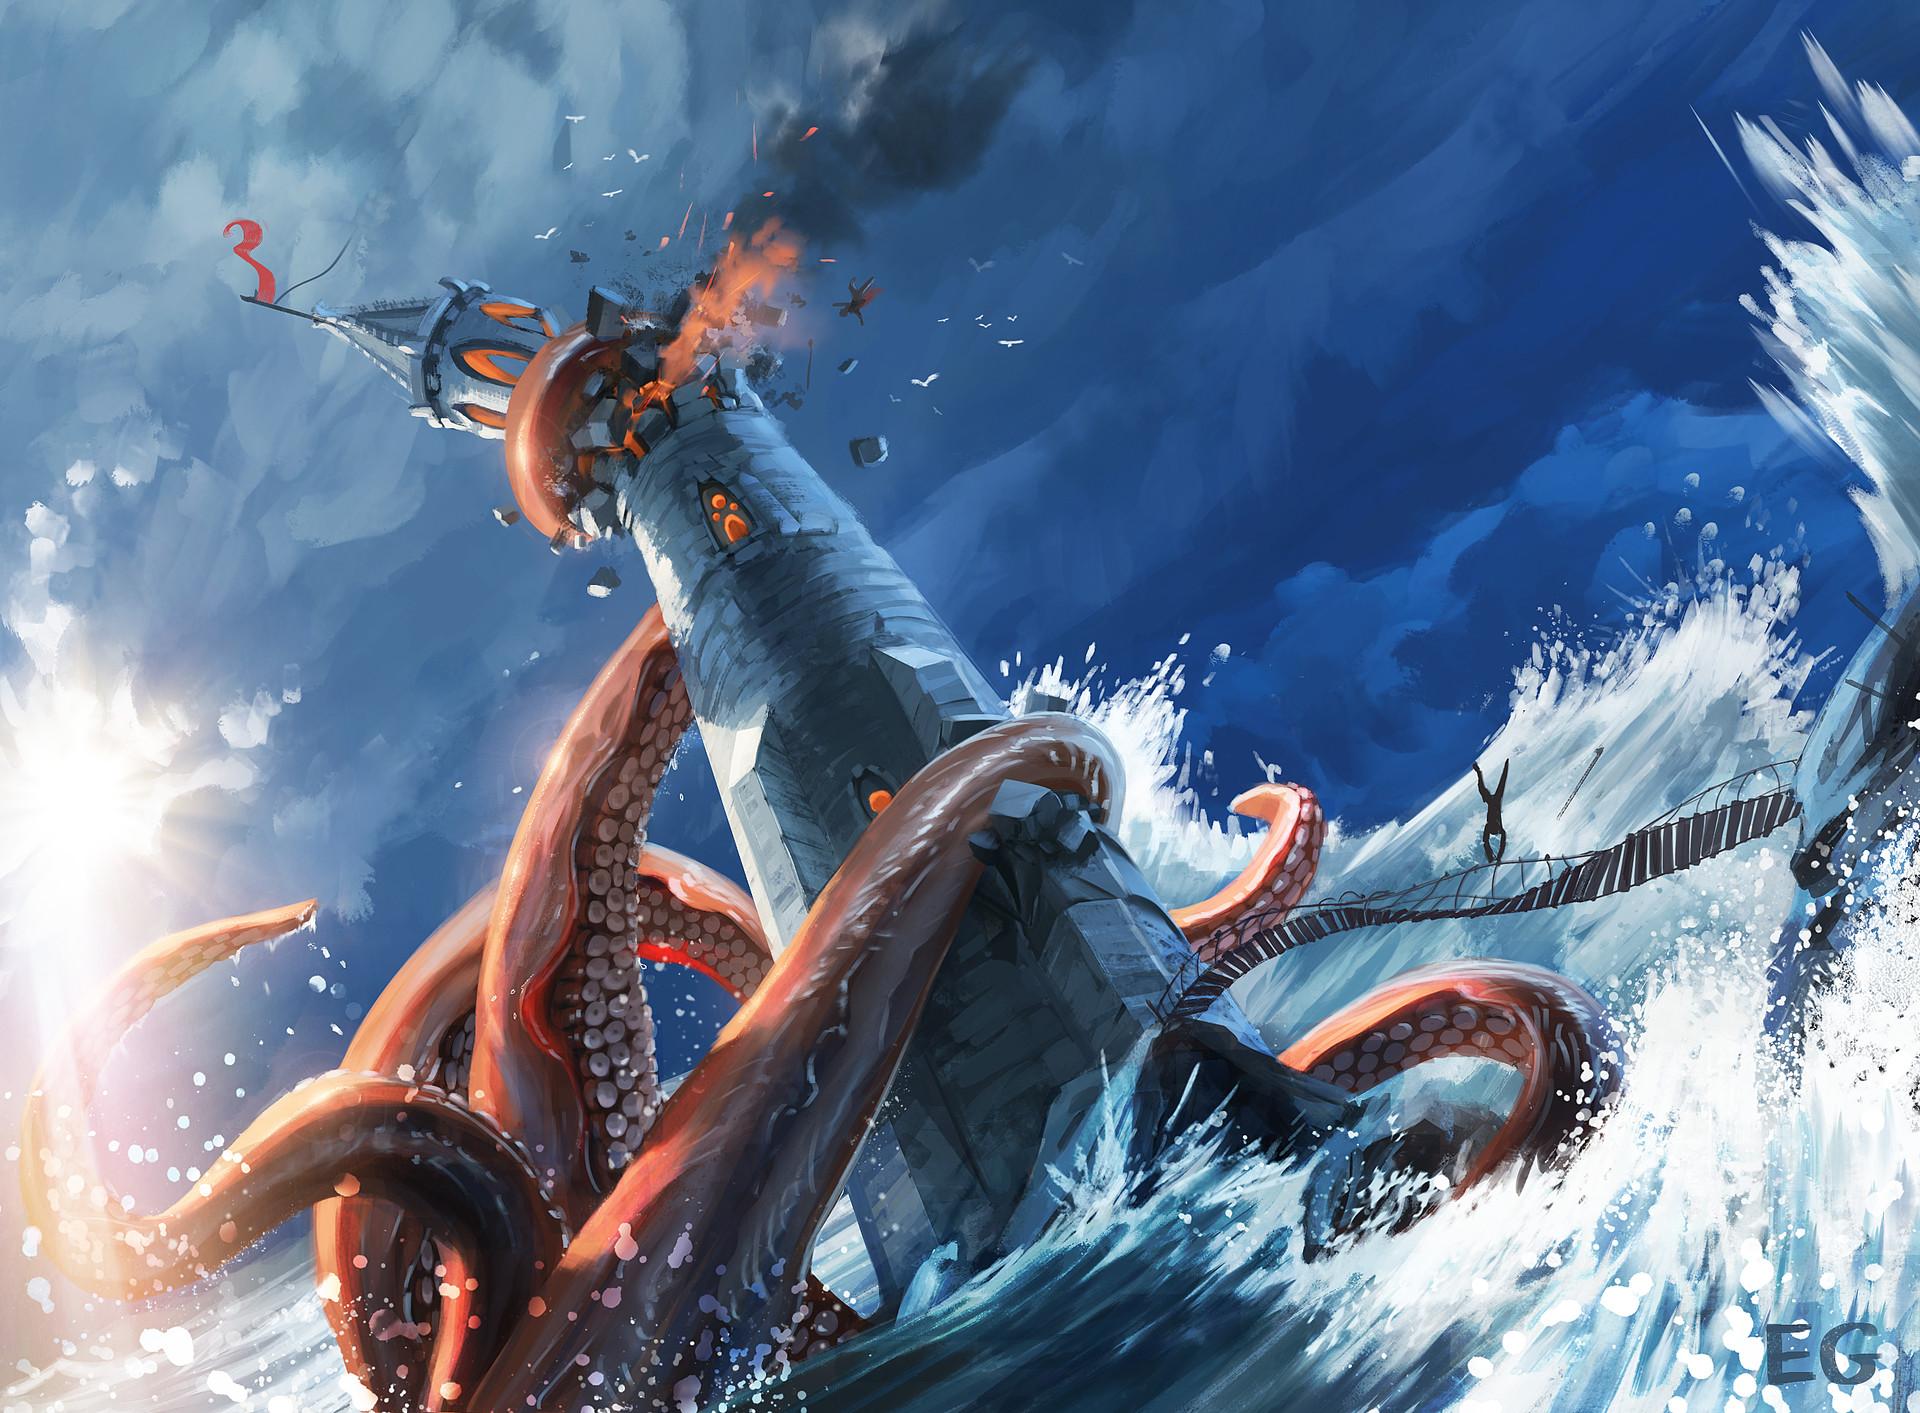 Eric geusz kraken wip6